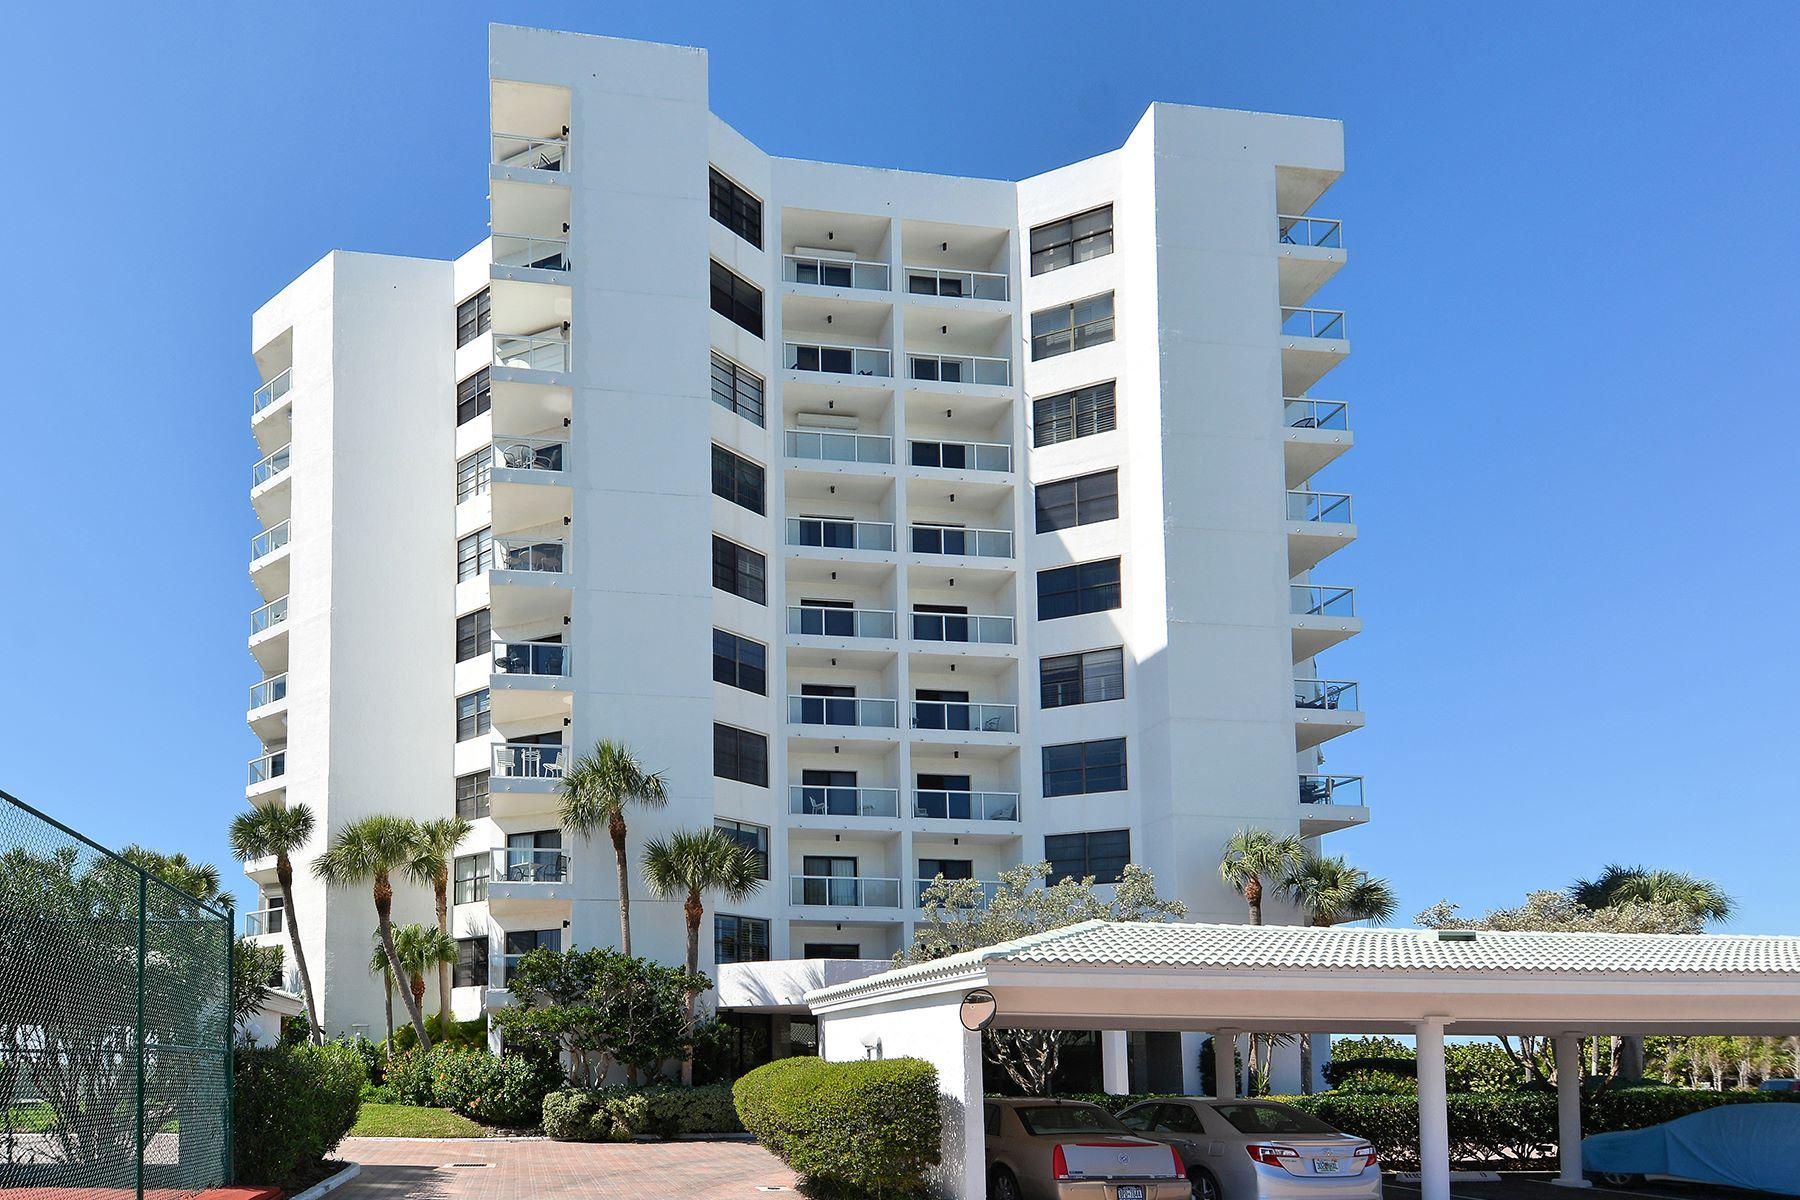 Condominium for Sale at LONGBOAT KEY 1050 Longboat Club Rd 305 Longboat Key, Florida, 34228 United States